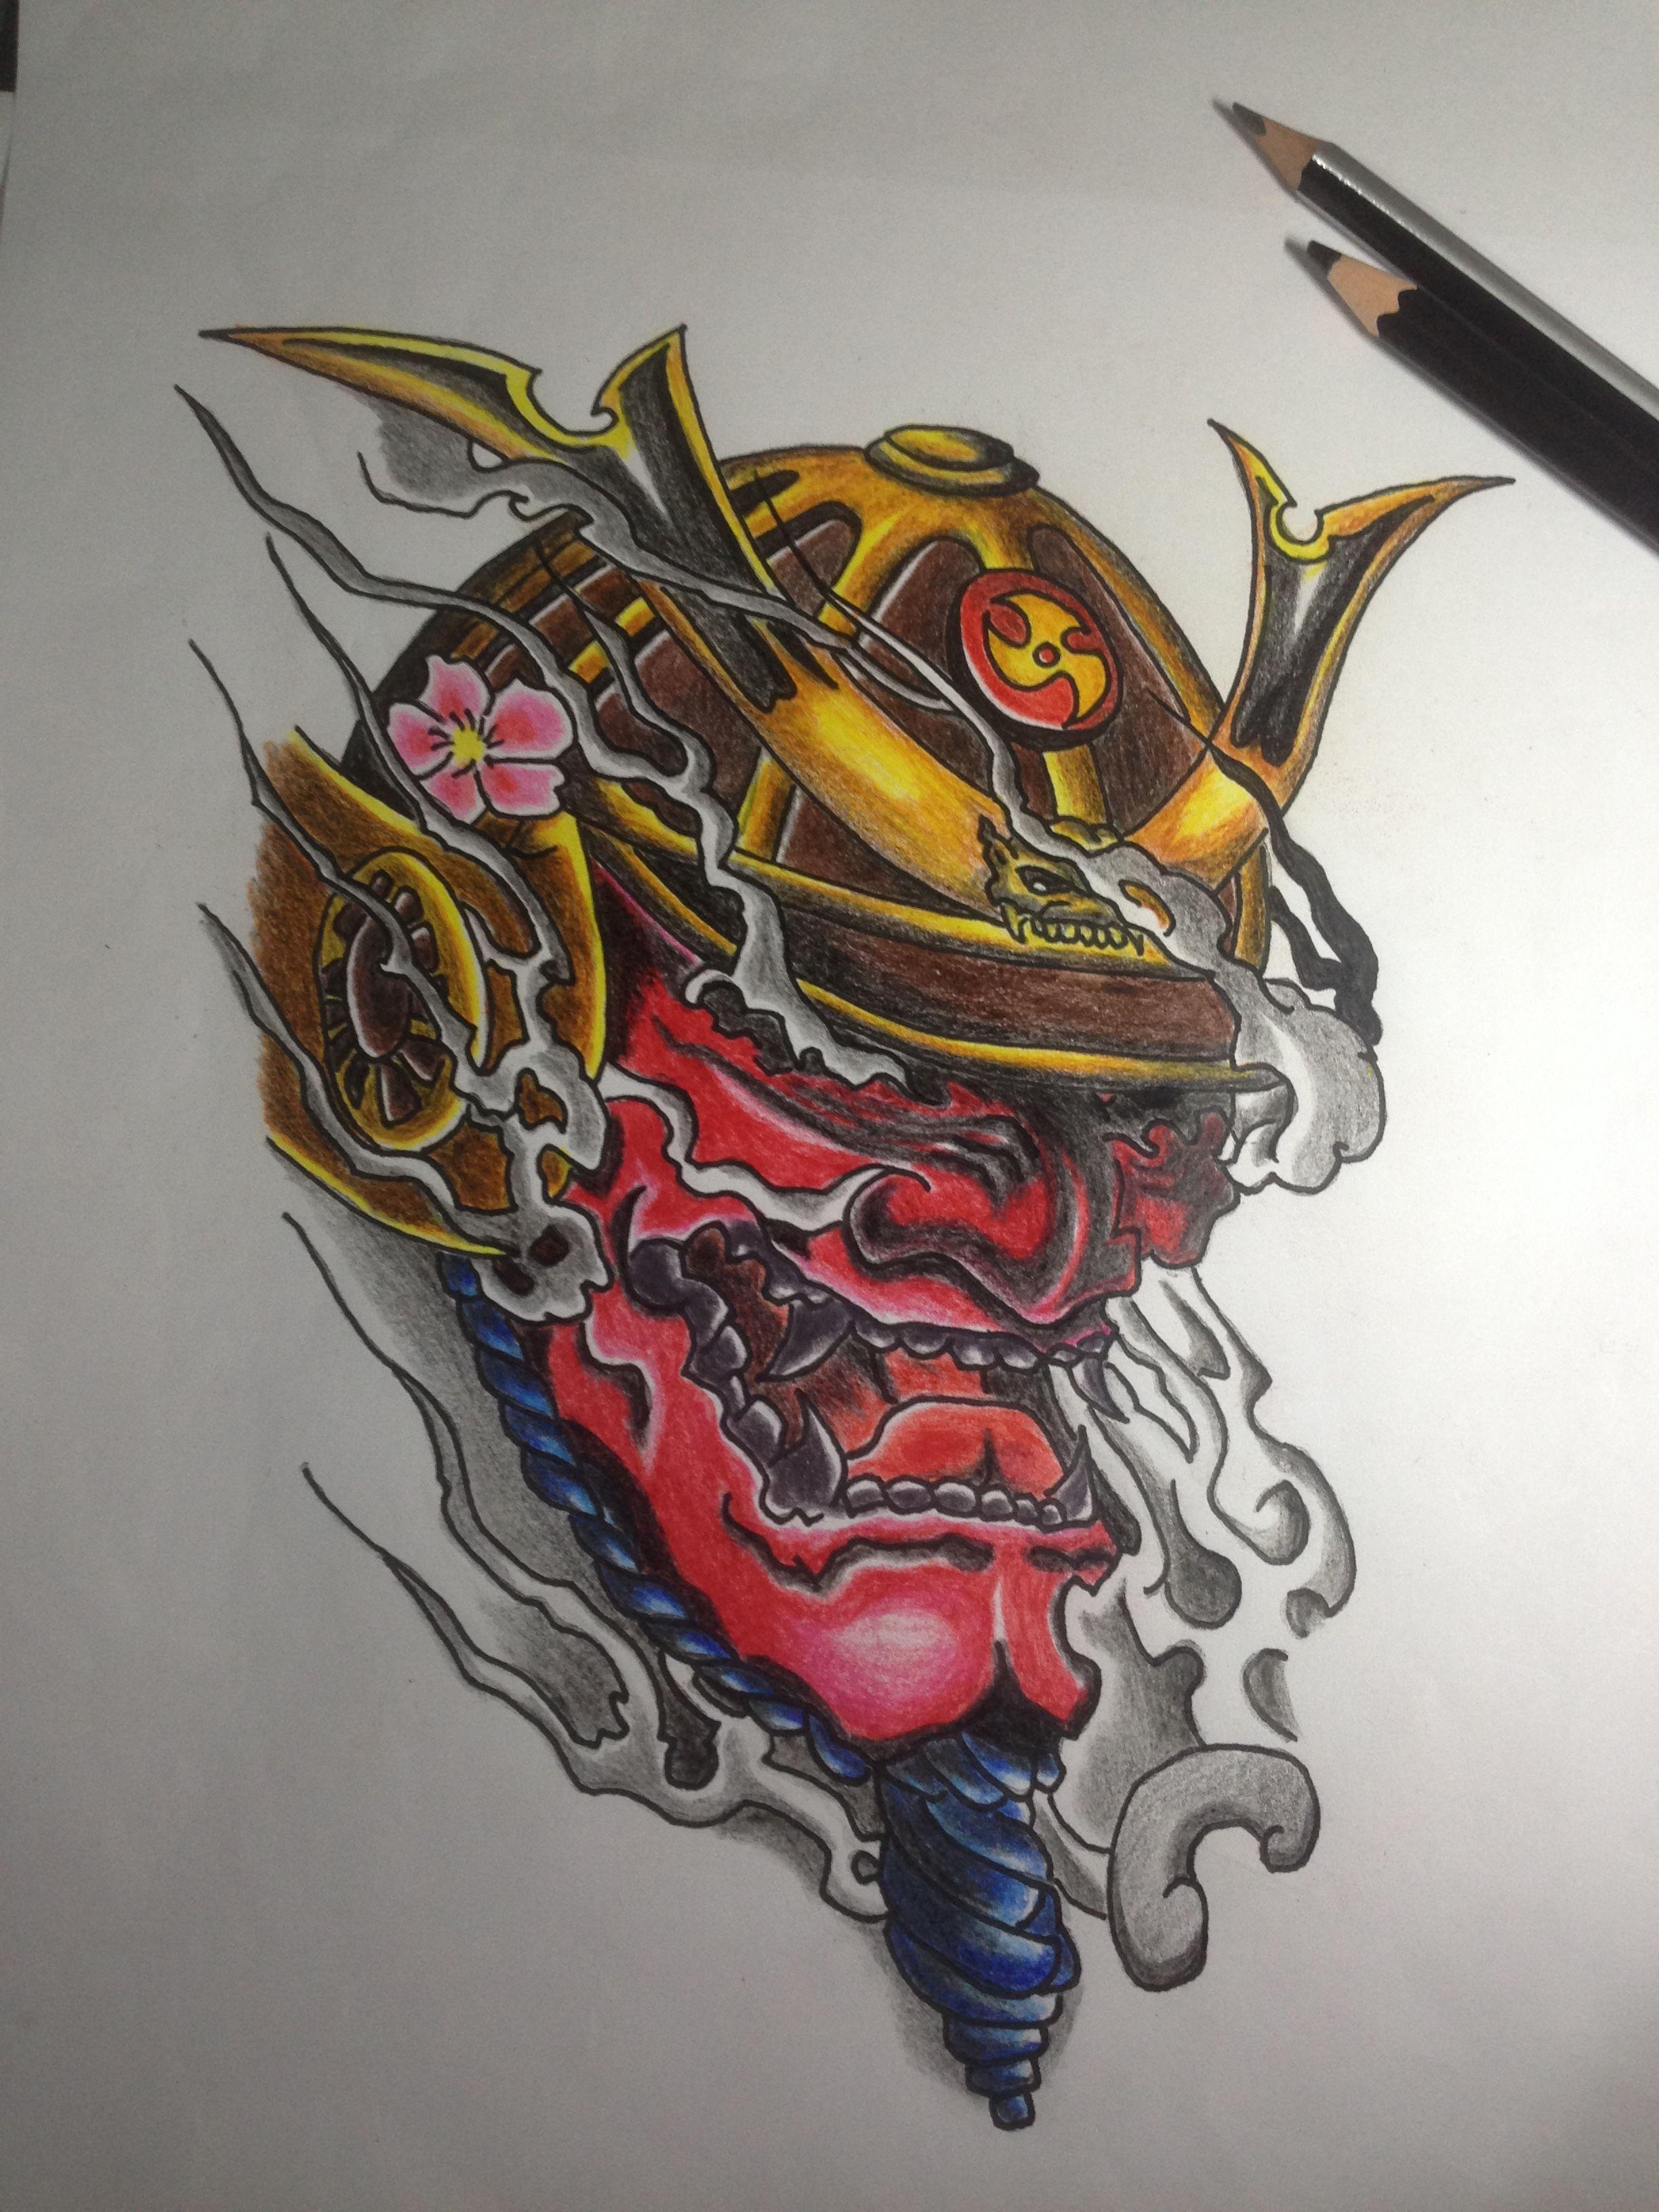 Japanese Samurai Draw And Colour The Sleeve Samurai Mask Tattoo